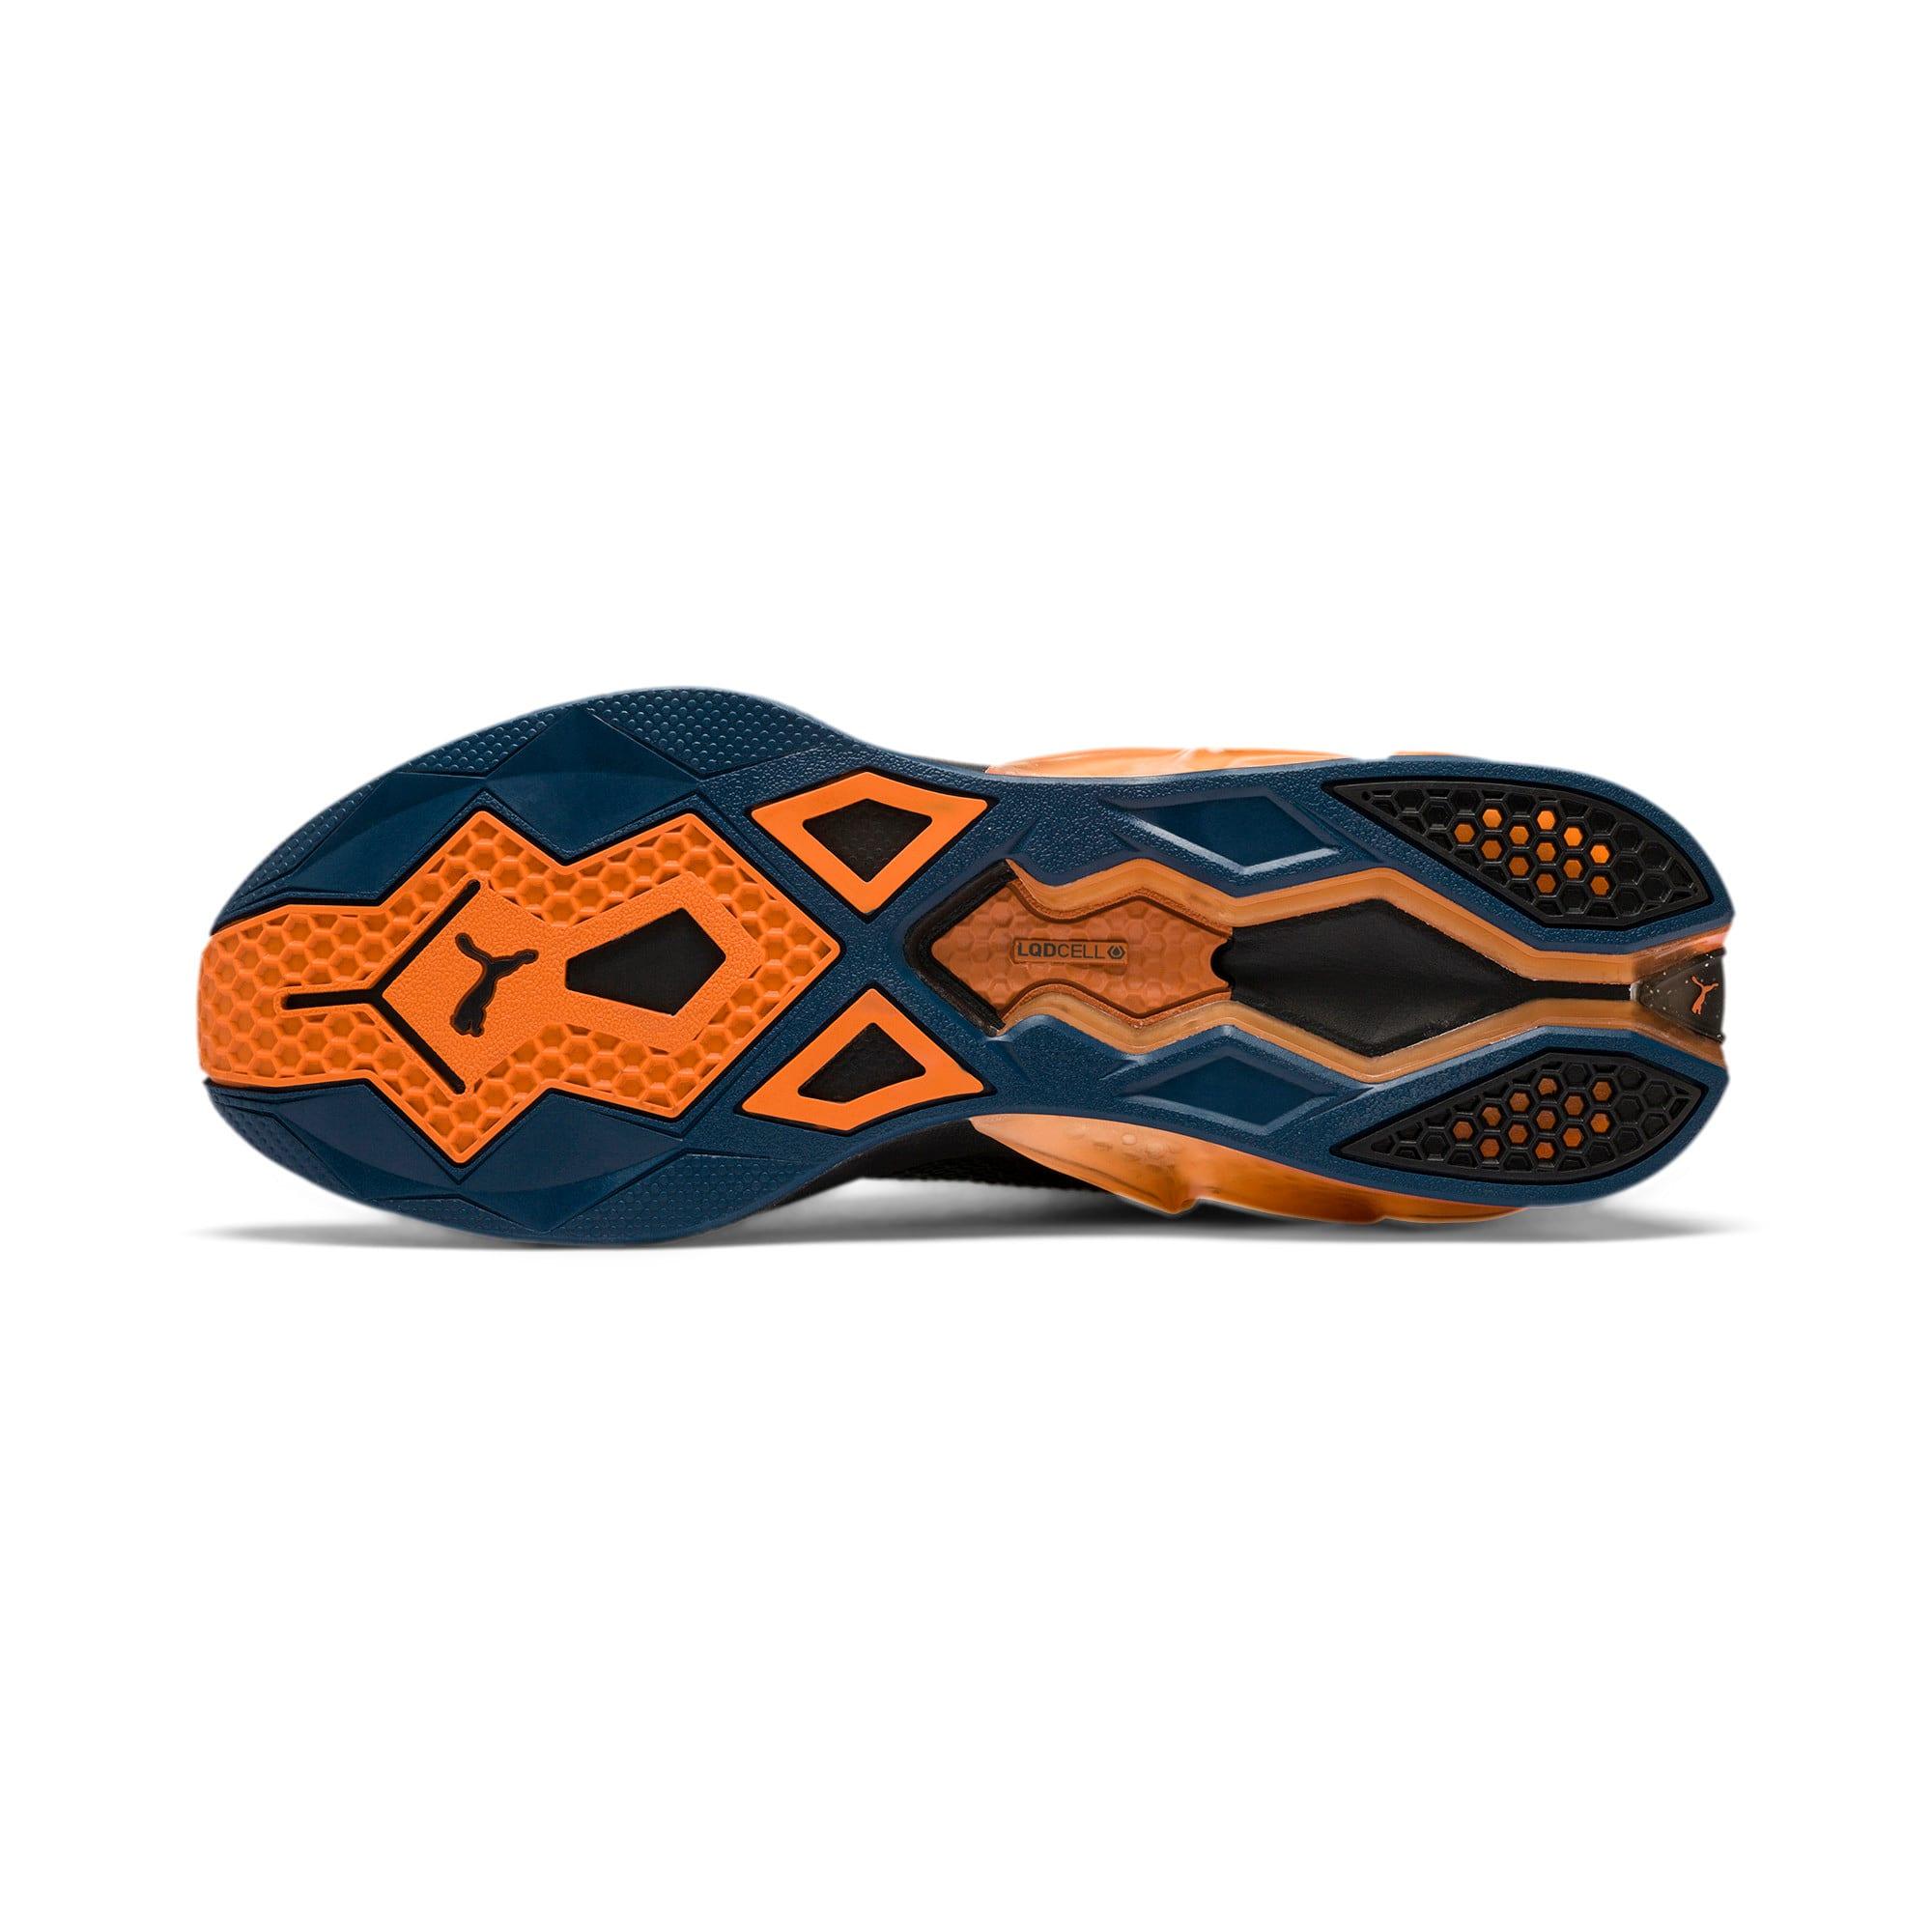 Thumbnail 5 of LQDCELL Origin Terrain Men's Shoes, CASTLEROCK-Puma Black, medium